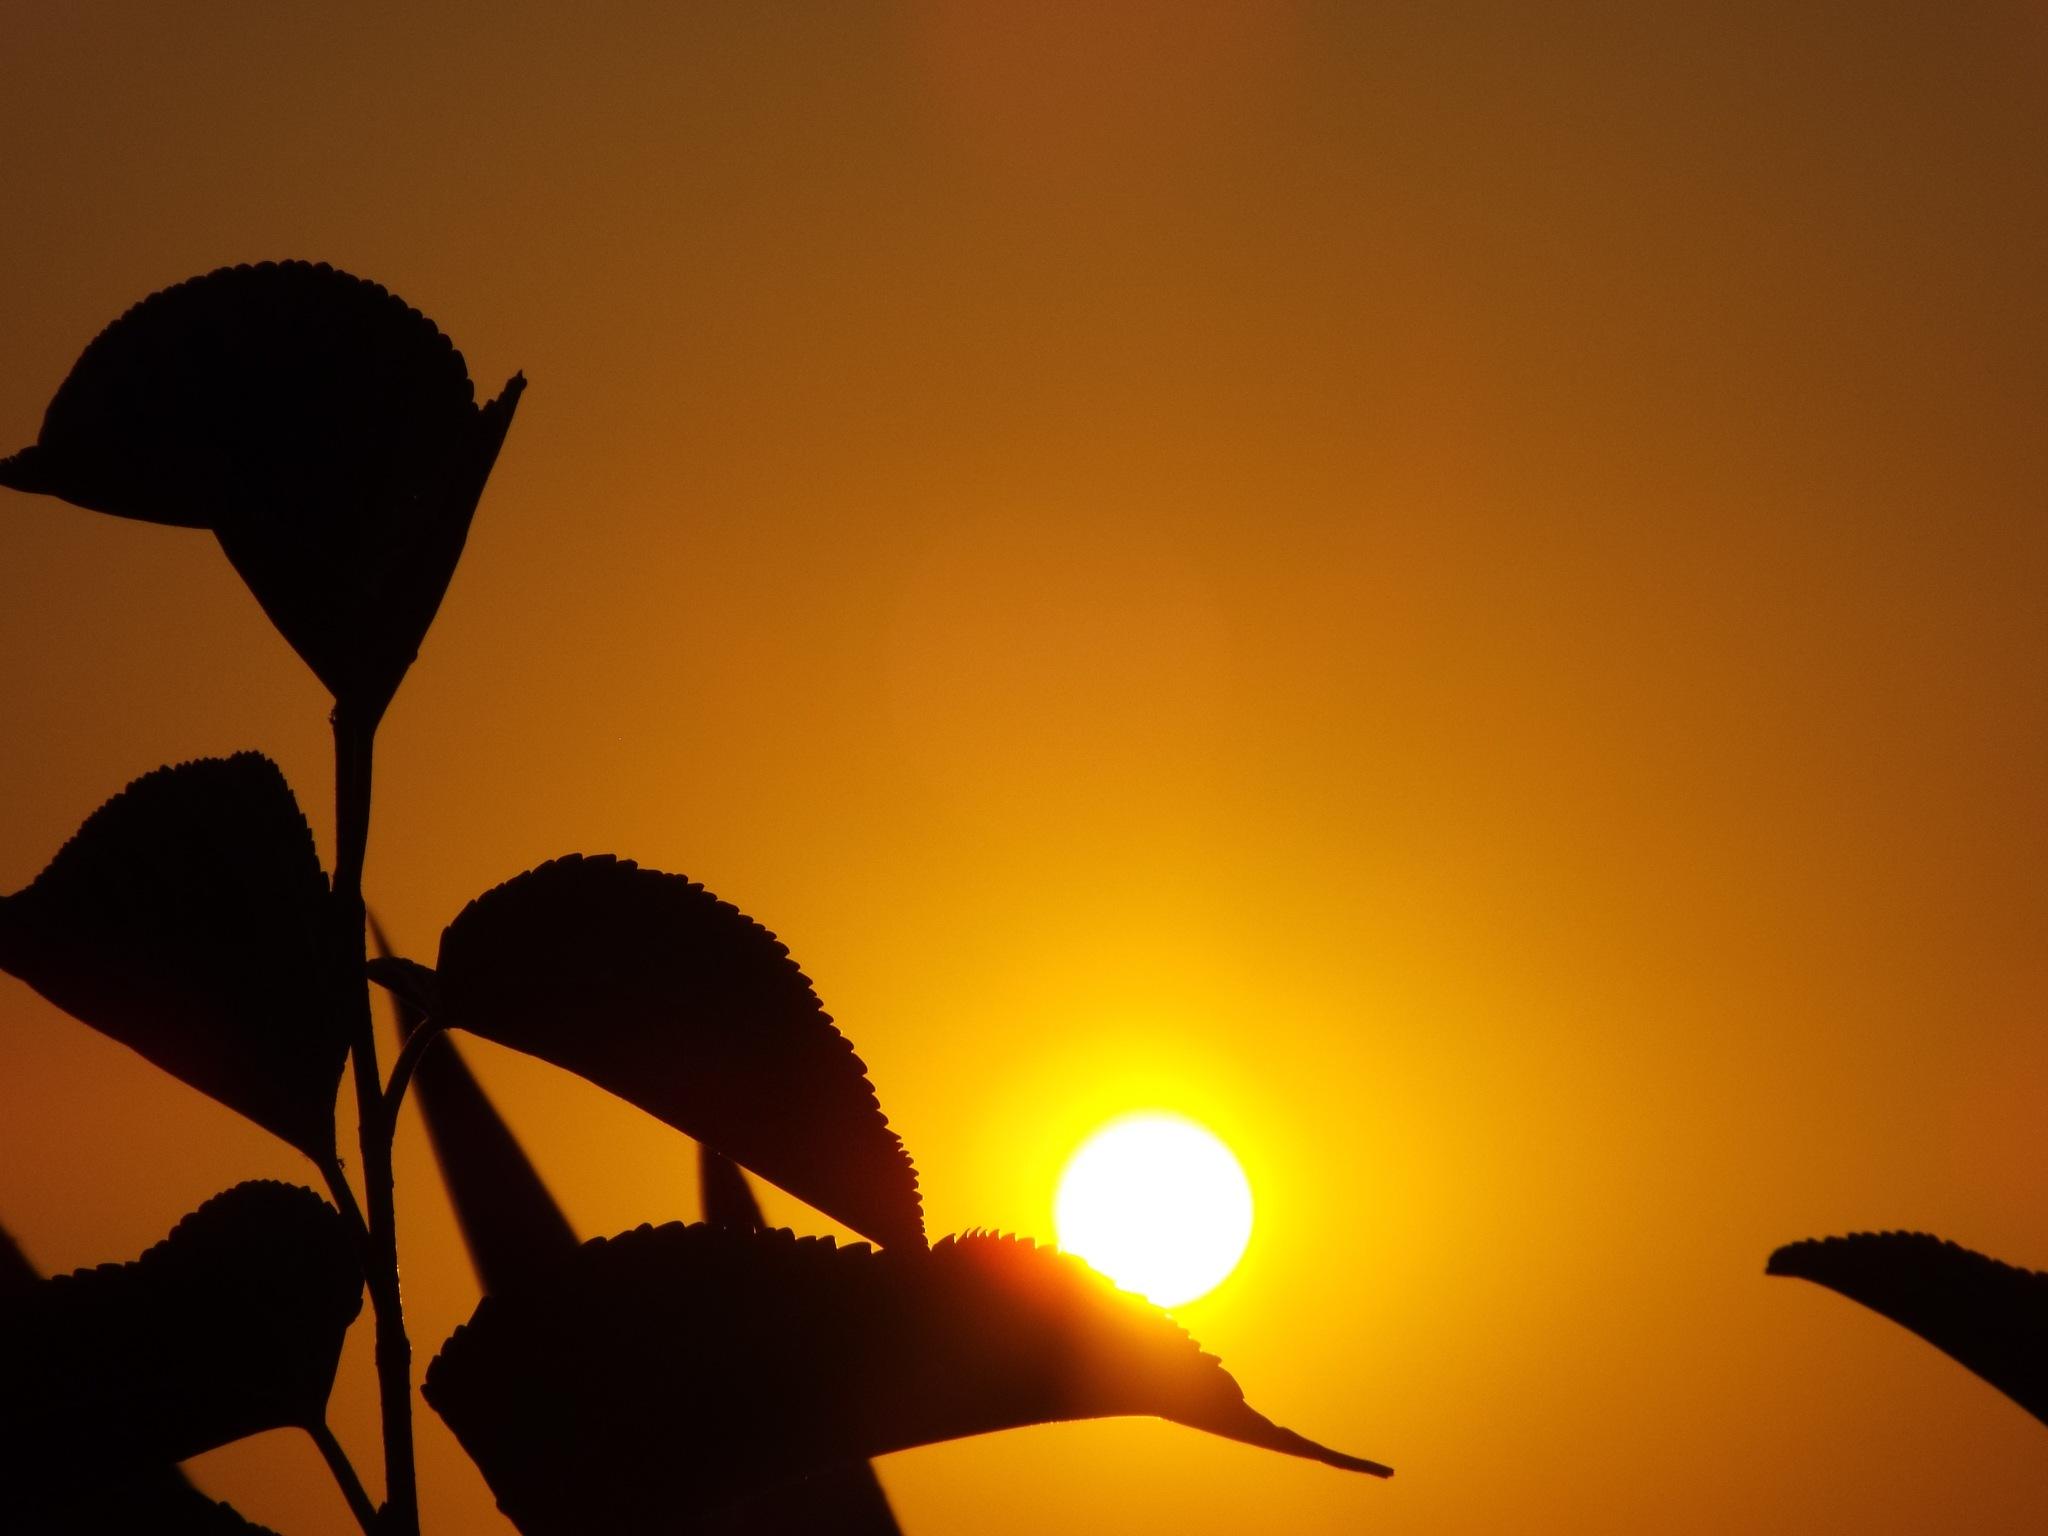 TONIGHT'S SUNSET, FULL SCREEN by Akin Saner